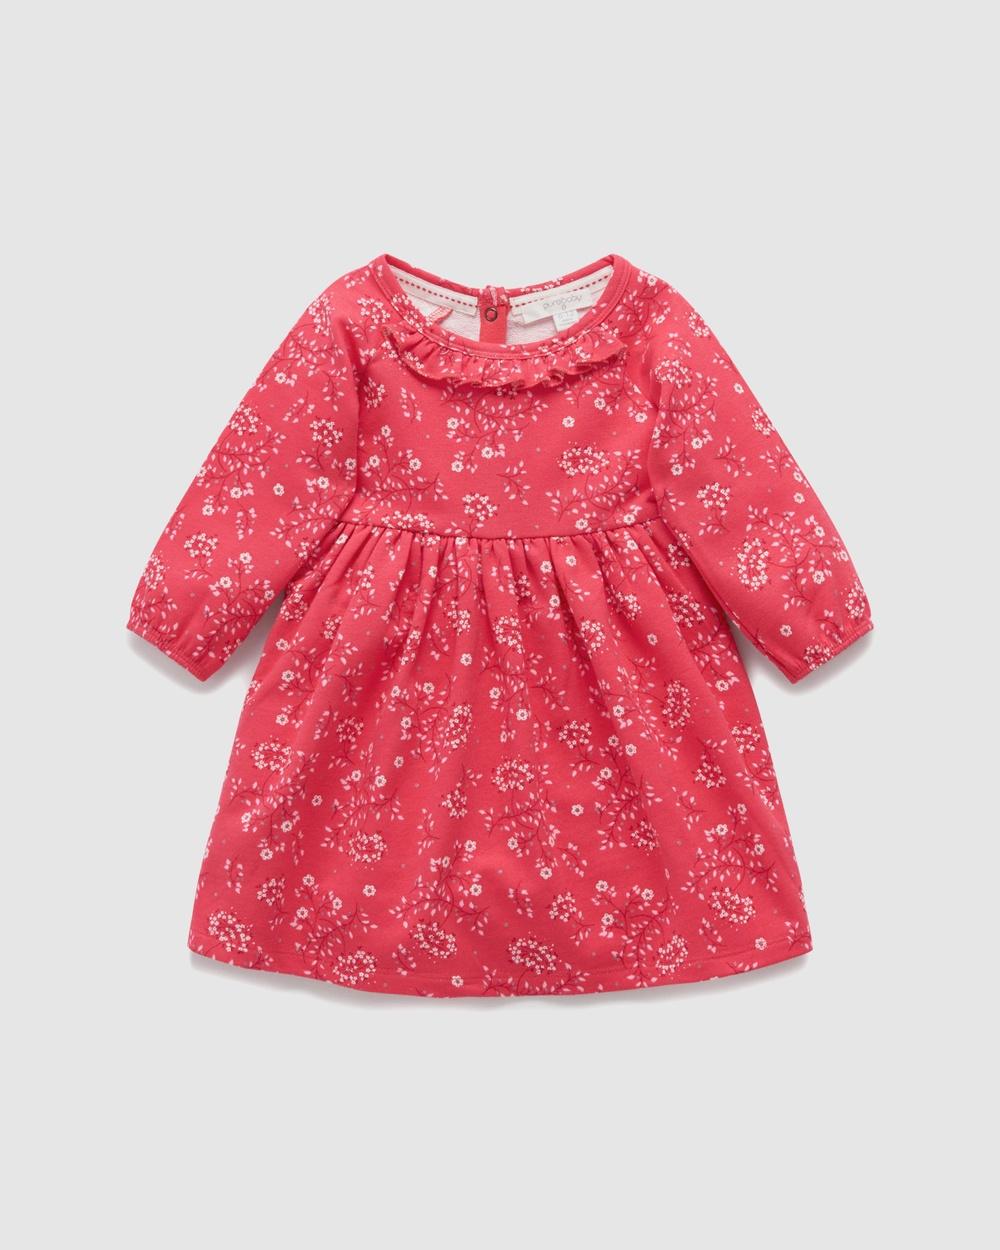 Purebaby Poppy Print Play Dress